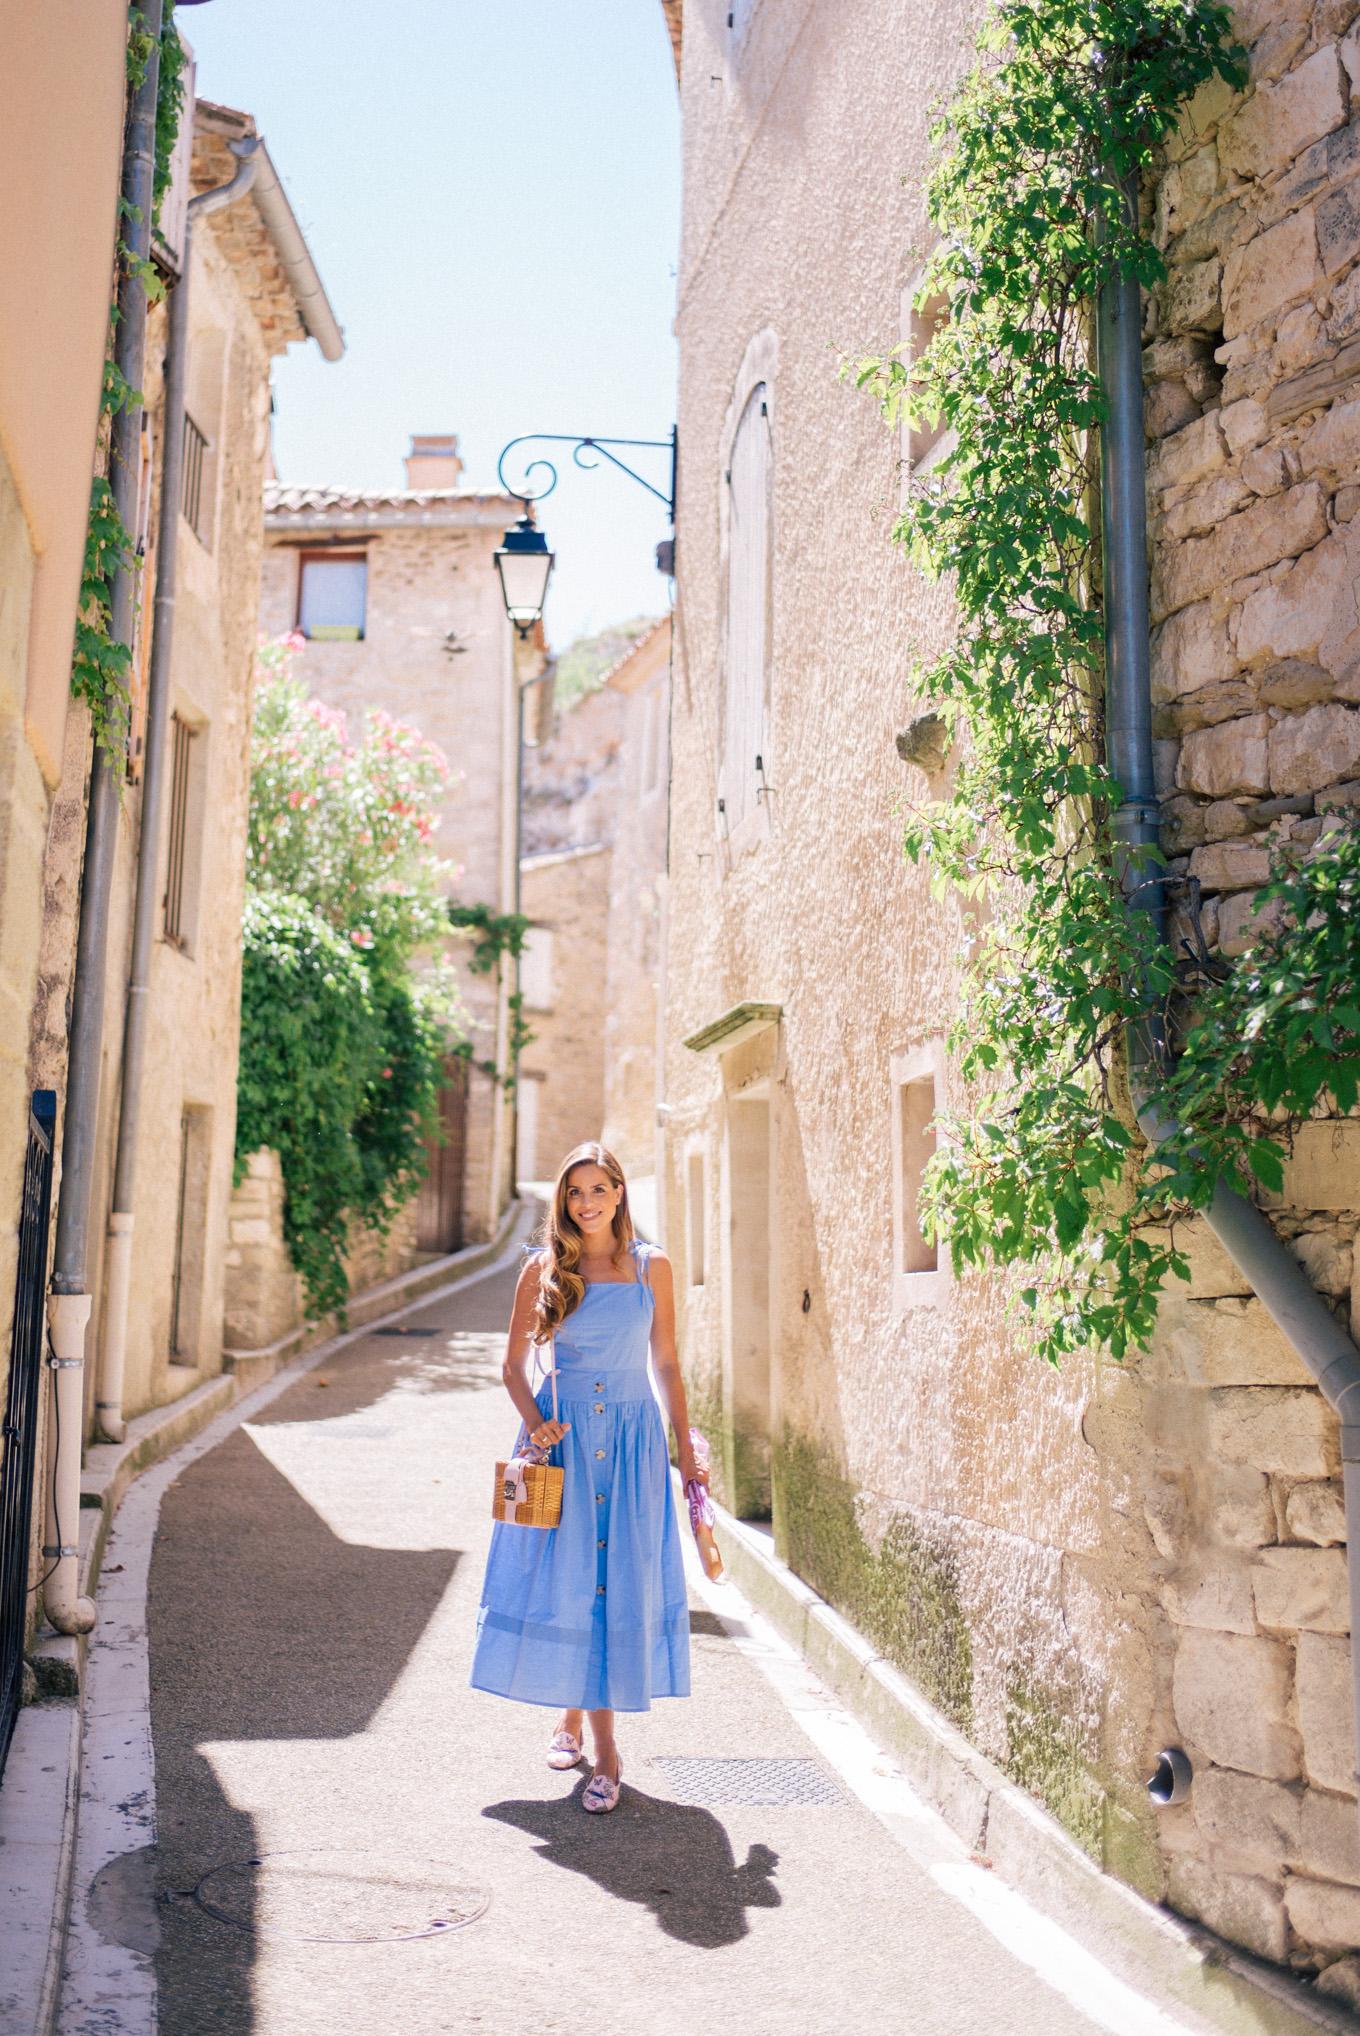 gal-meets-glam-avignon-provence-1002270